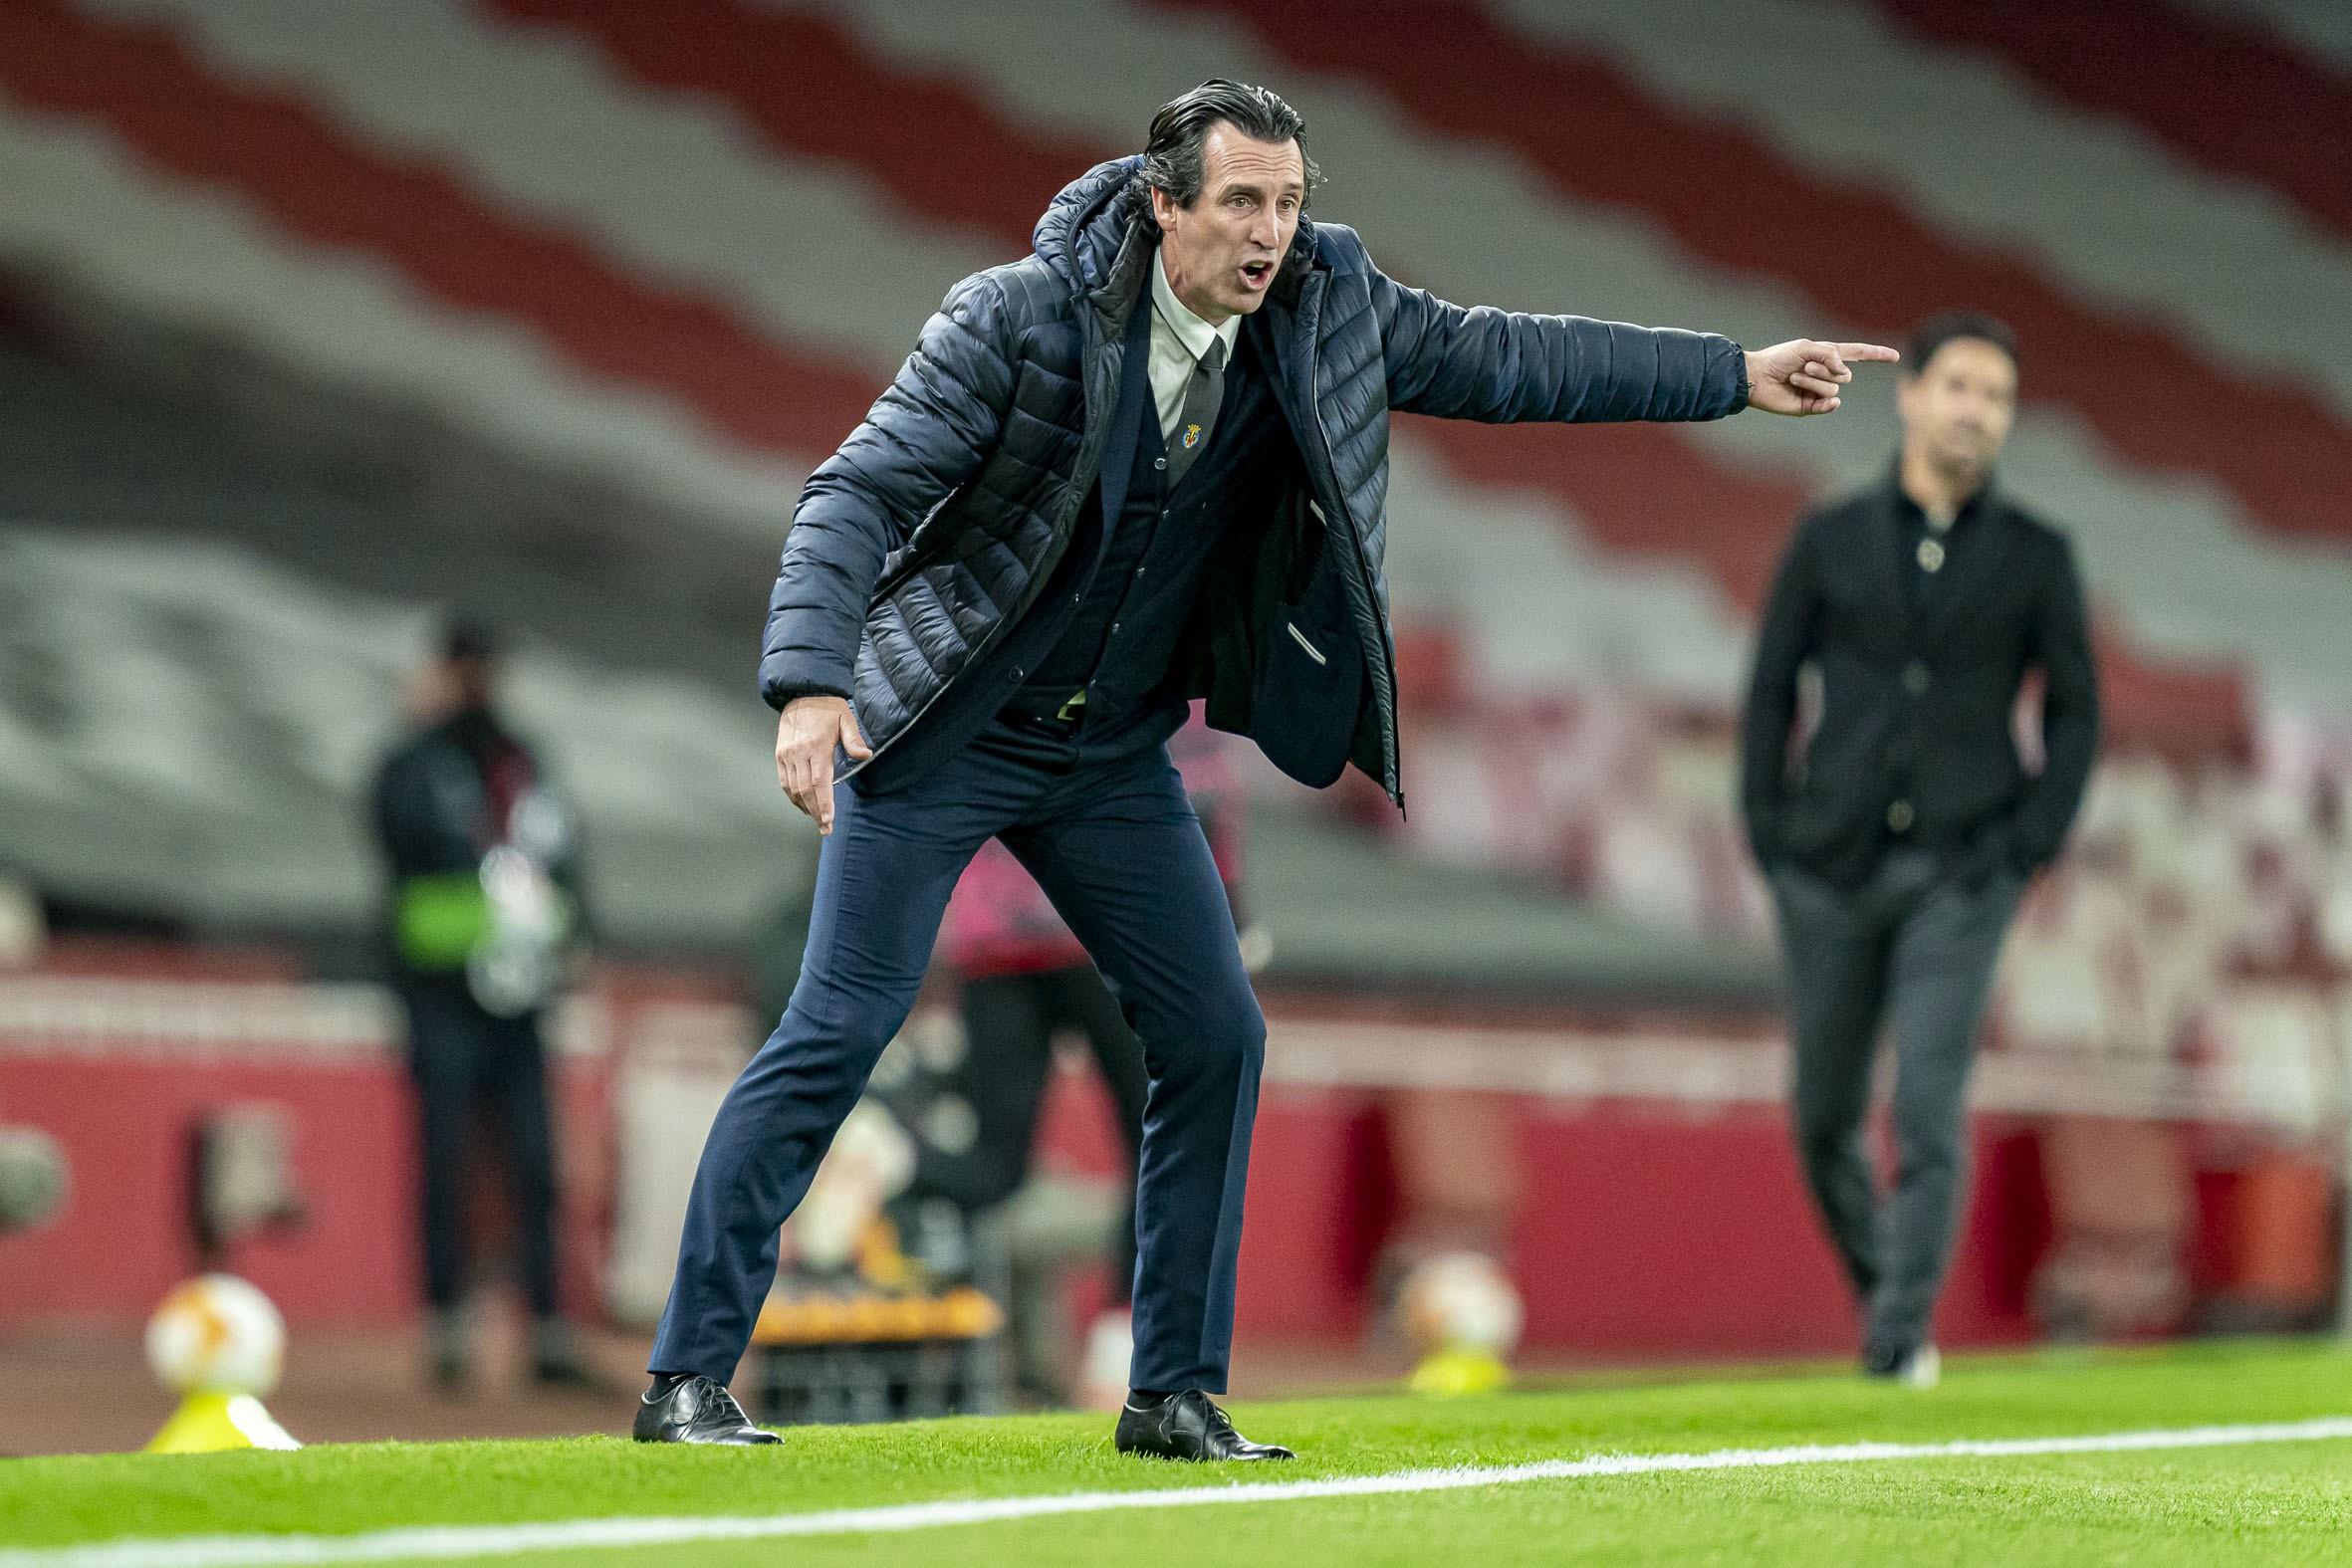 Bagi Emery, sepak bola tidak memiliki tempat untuk bermimpi, melainkan kristalisasi dari hasil kerja keras yang tiada henti.  Foto: Villarreal CF